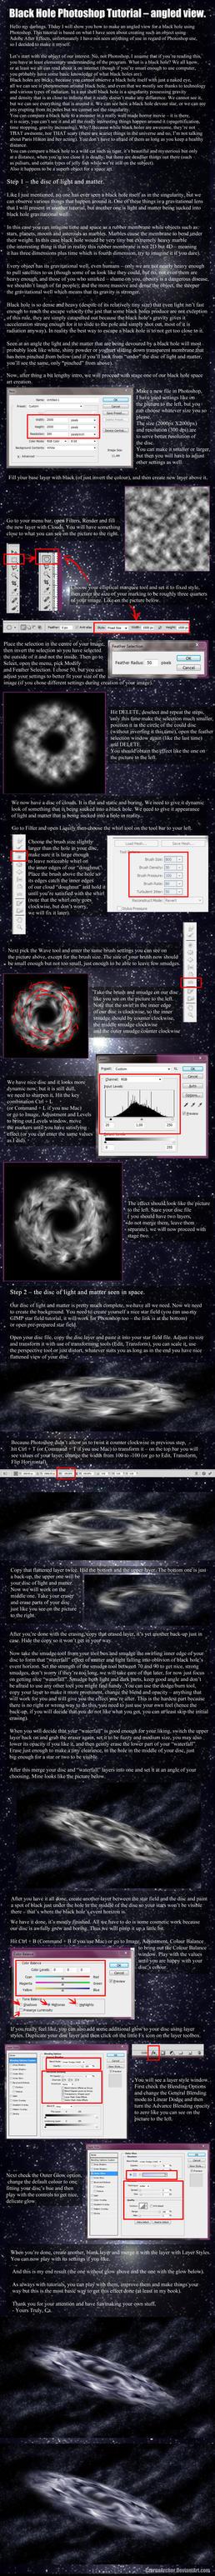 Black Hole Photoshop Tutorial (angled). by CzarnaArcher